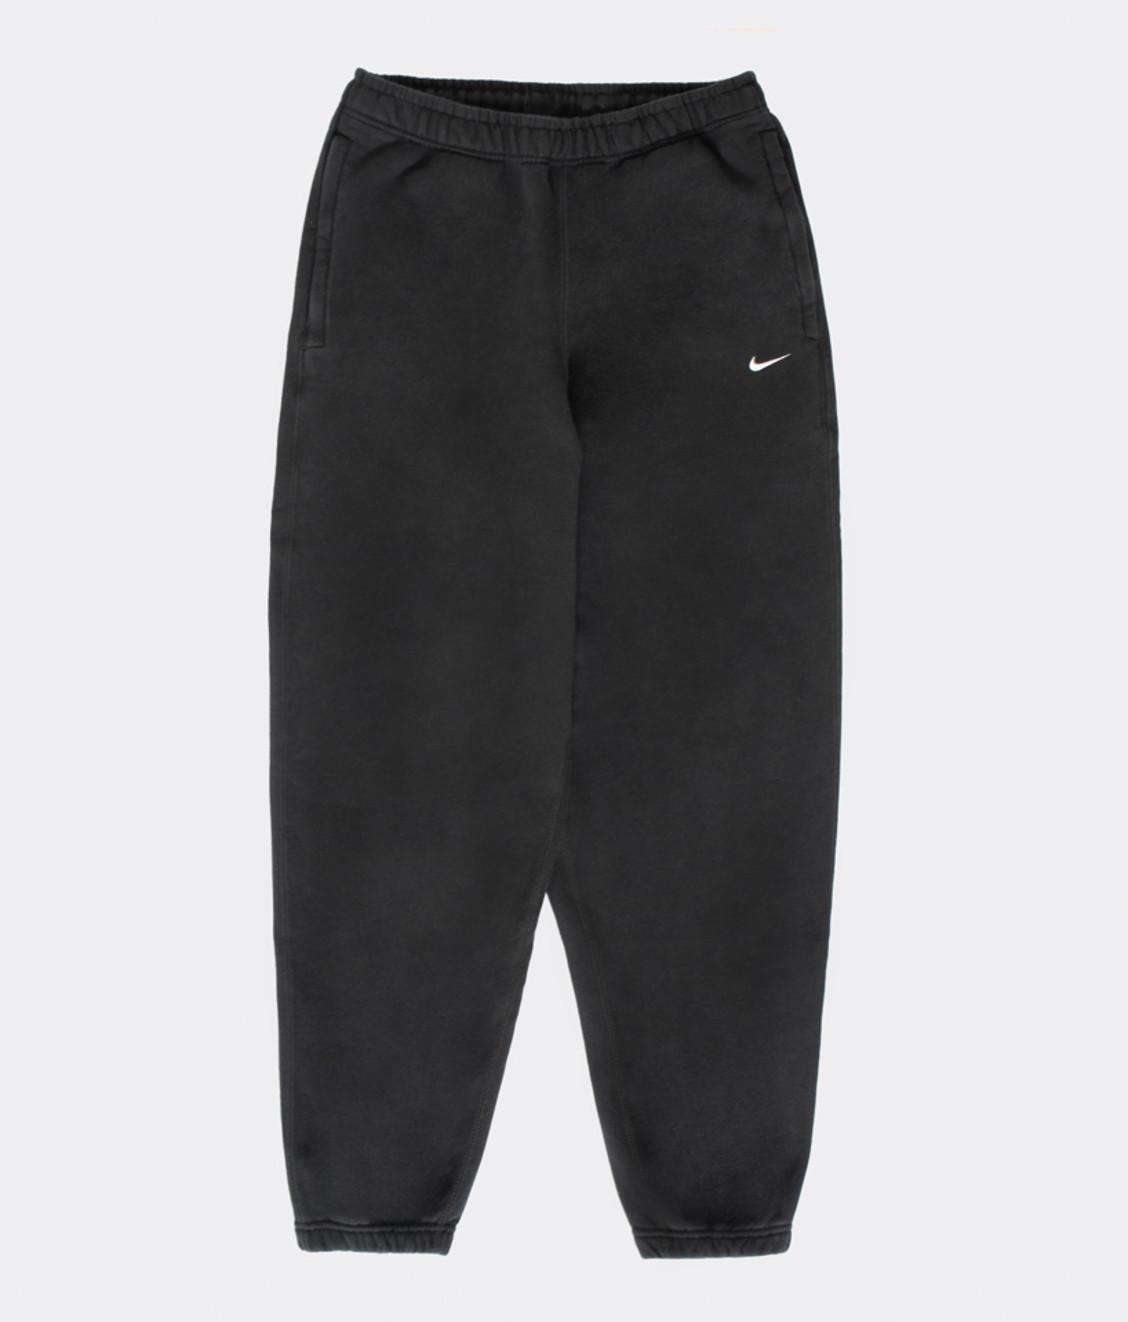 Nike Nike NRG Pant Wash Black/White